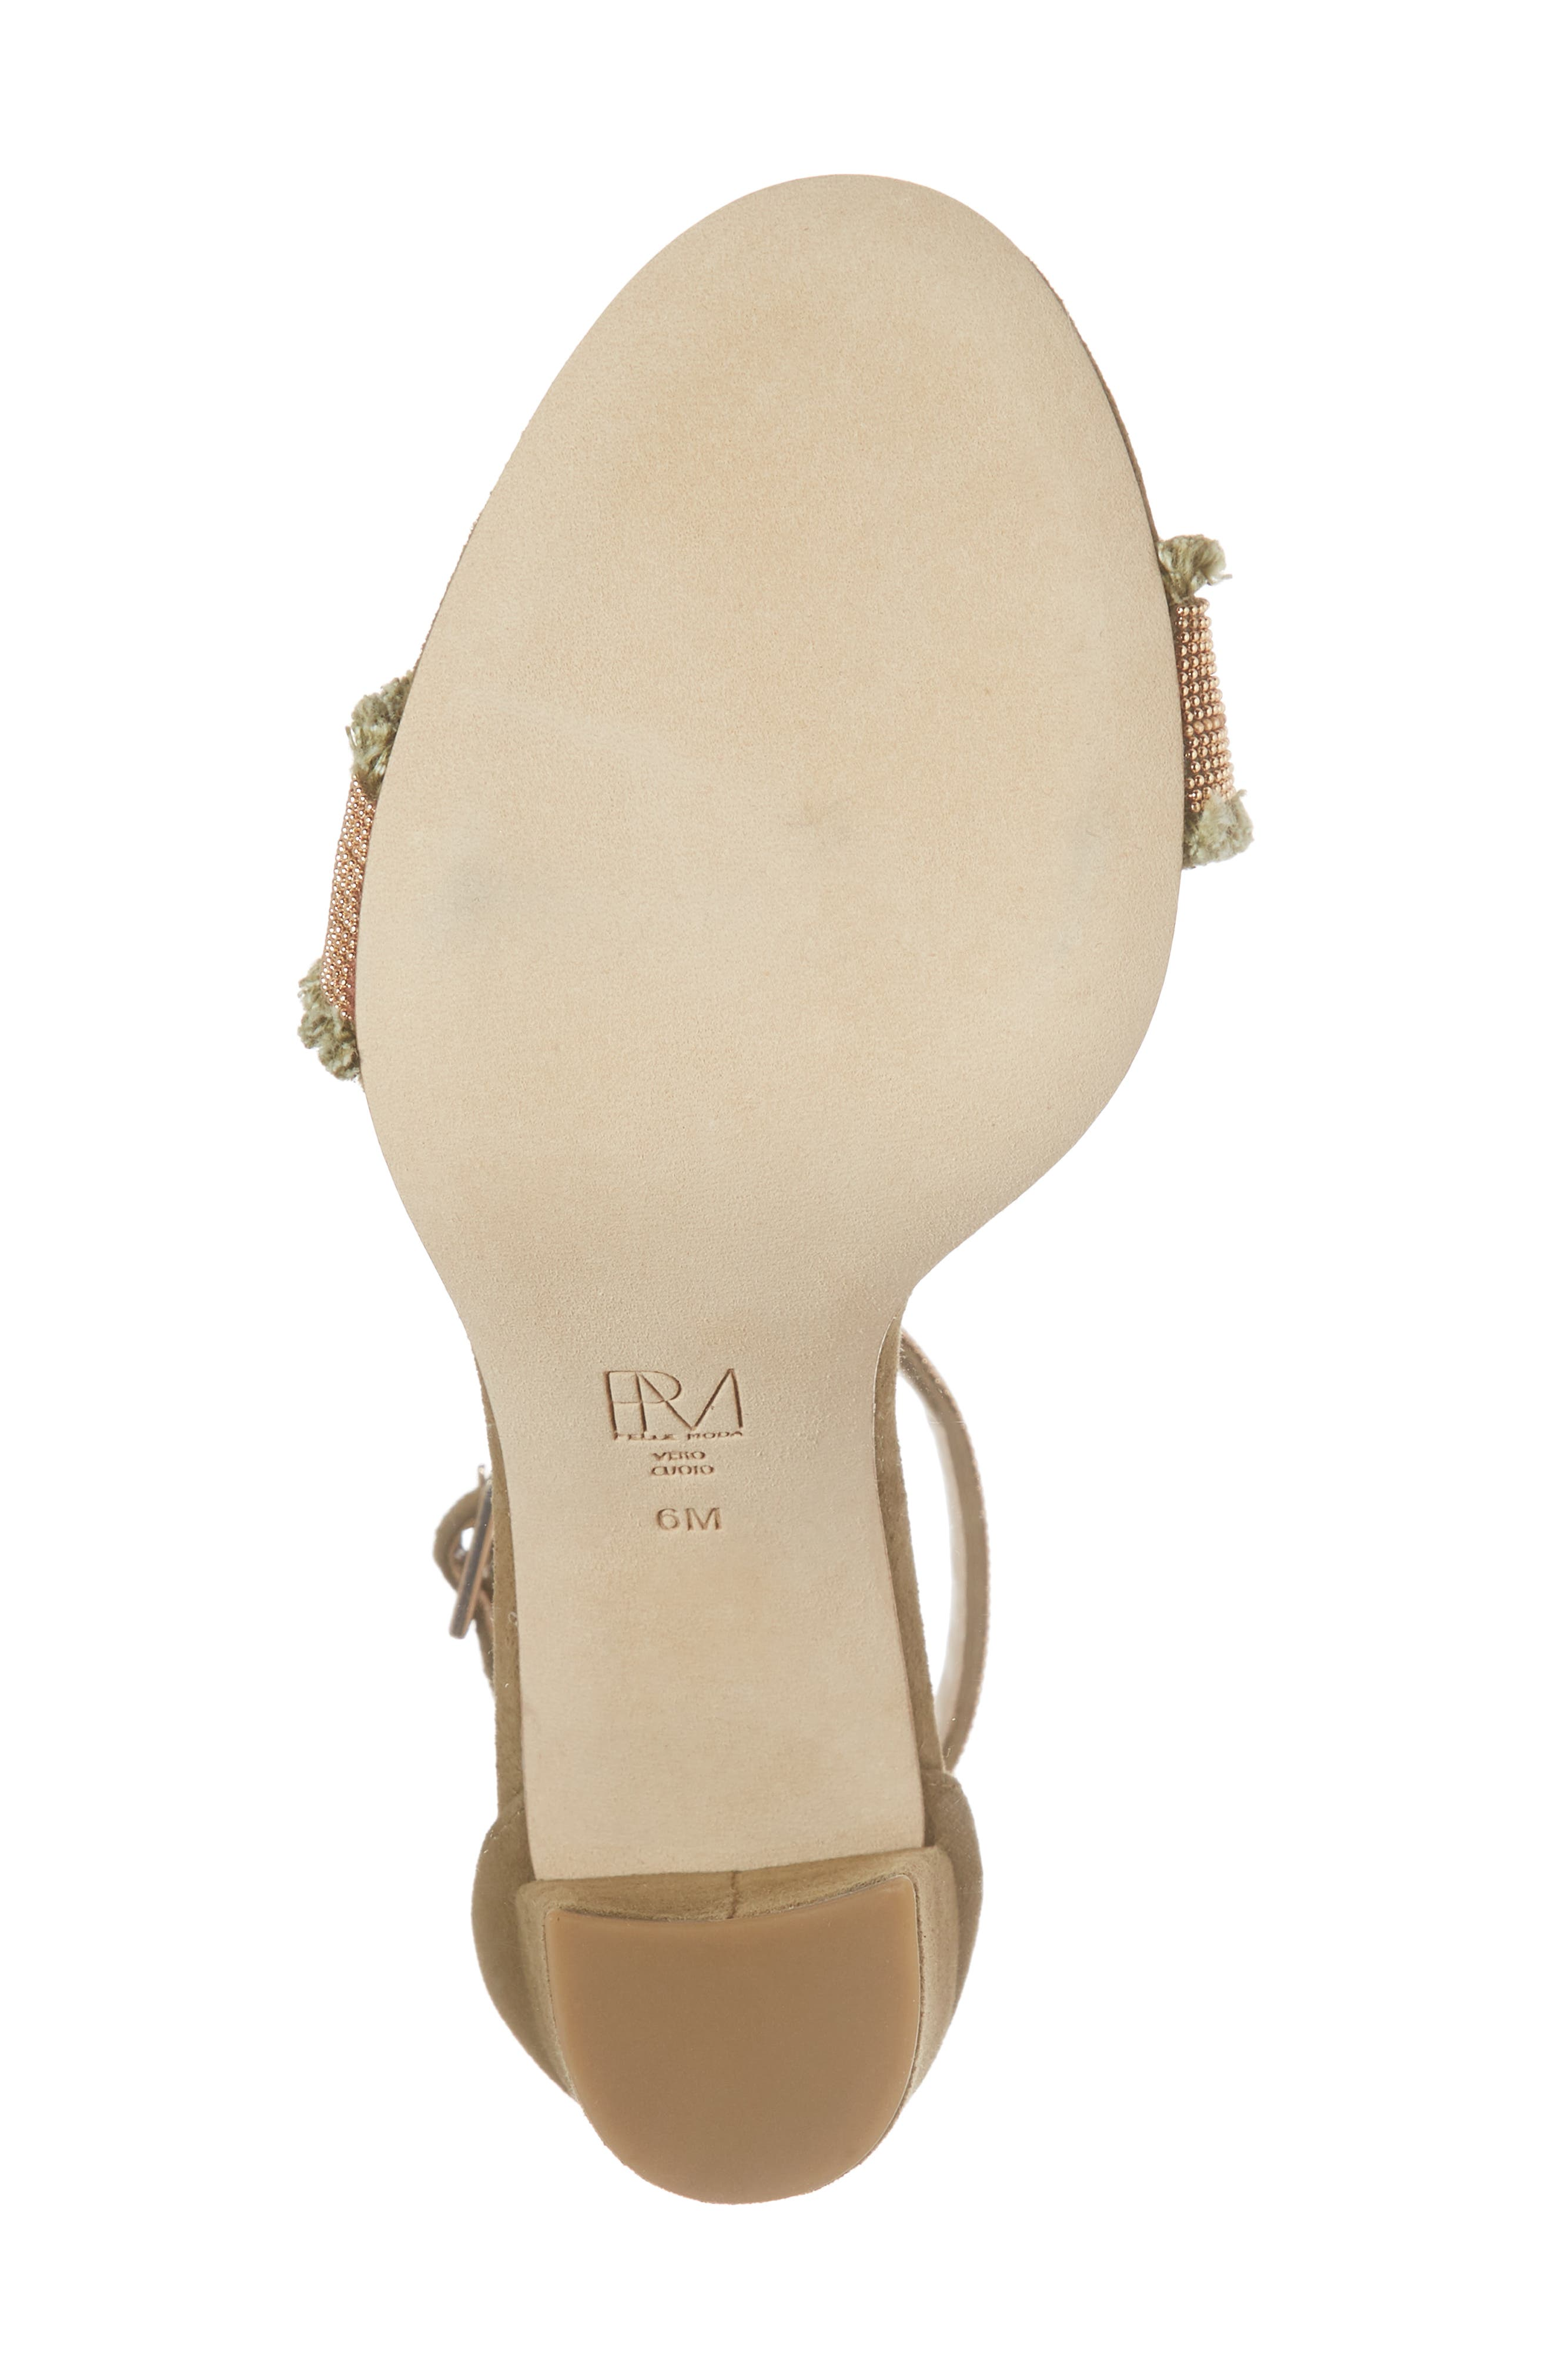 Bonnie6 Embellished Sandal,                             Alternate thumbnail 6, color,                             KHAKI SUEDE